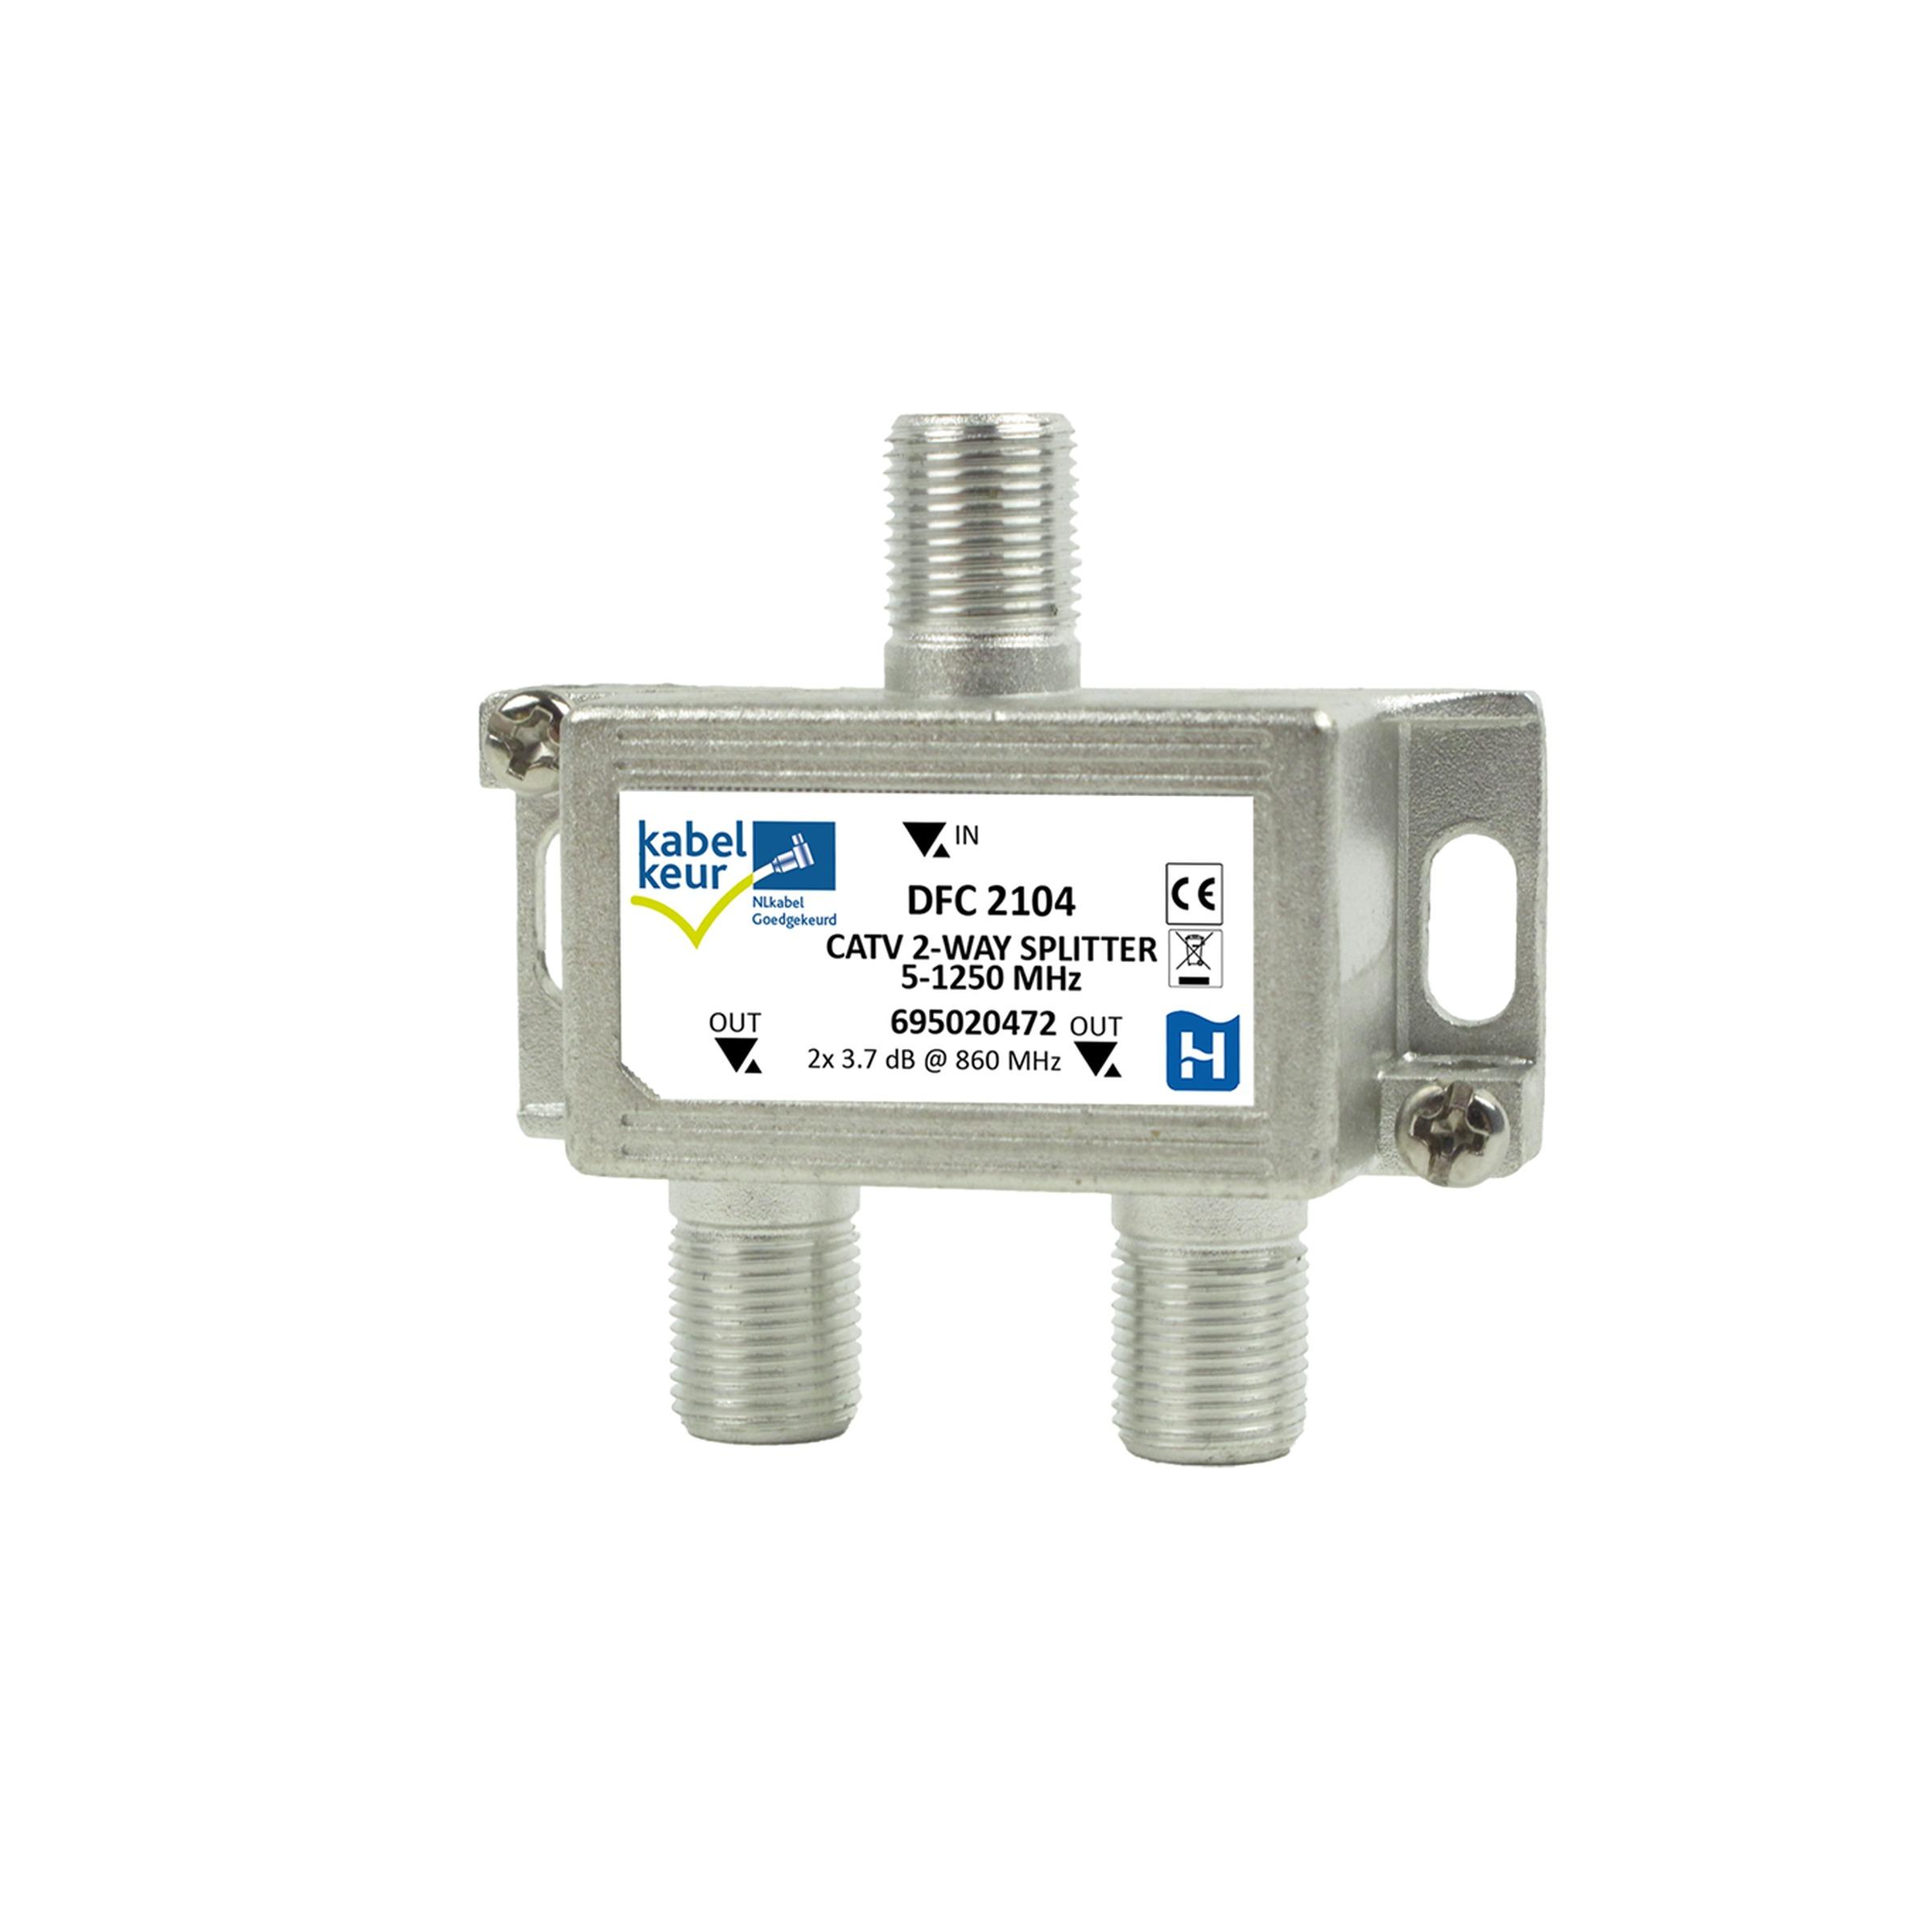 HIRSCHMANN tweeverdeler F-connector SHOP DFC 2104